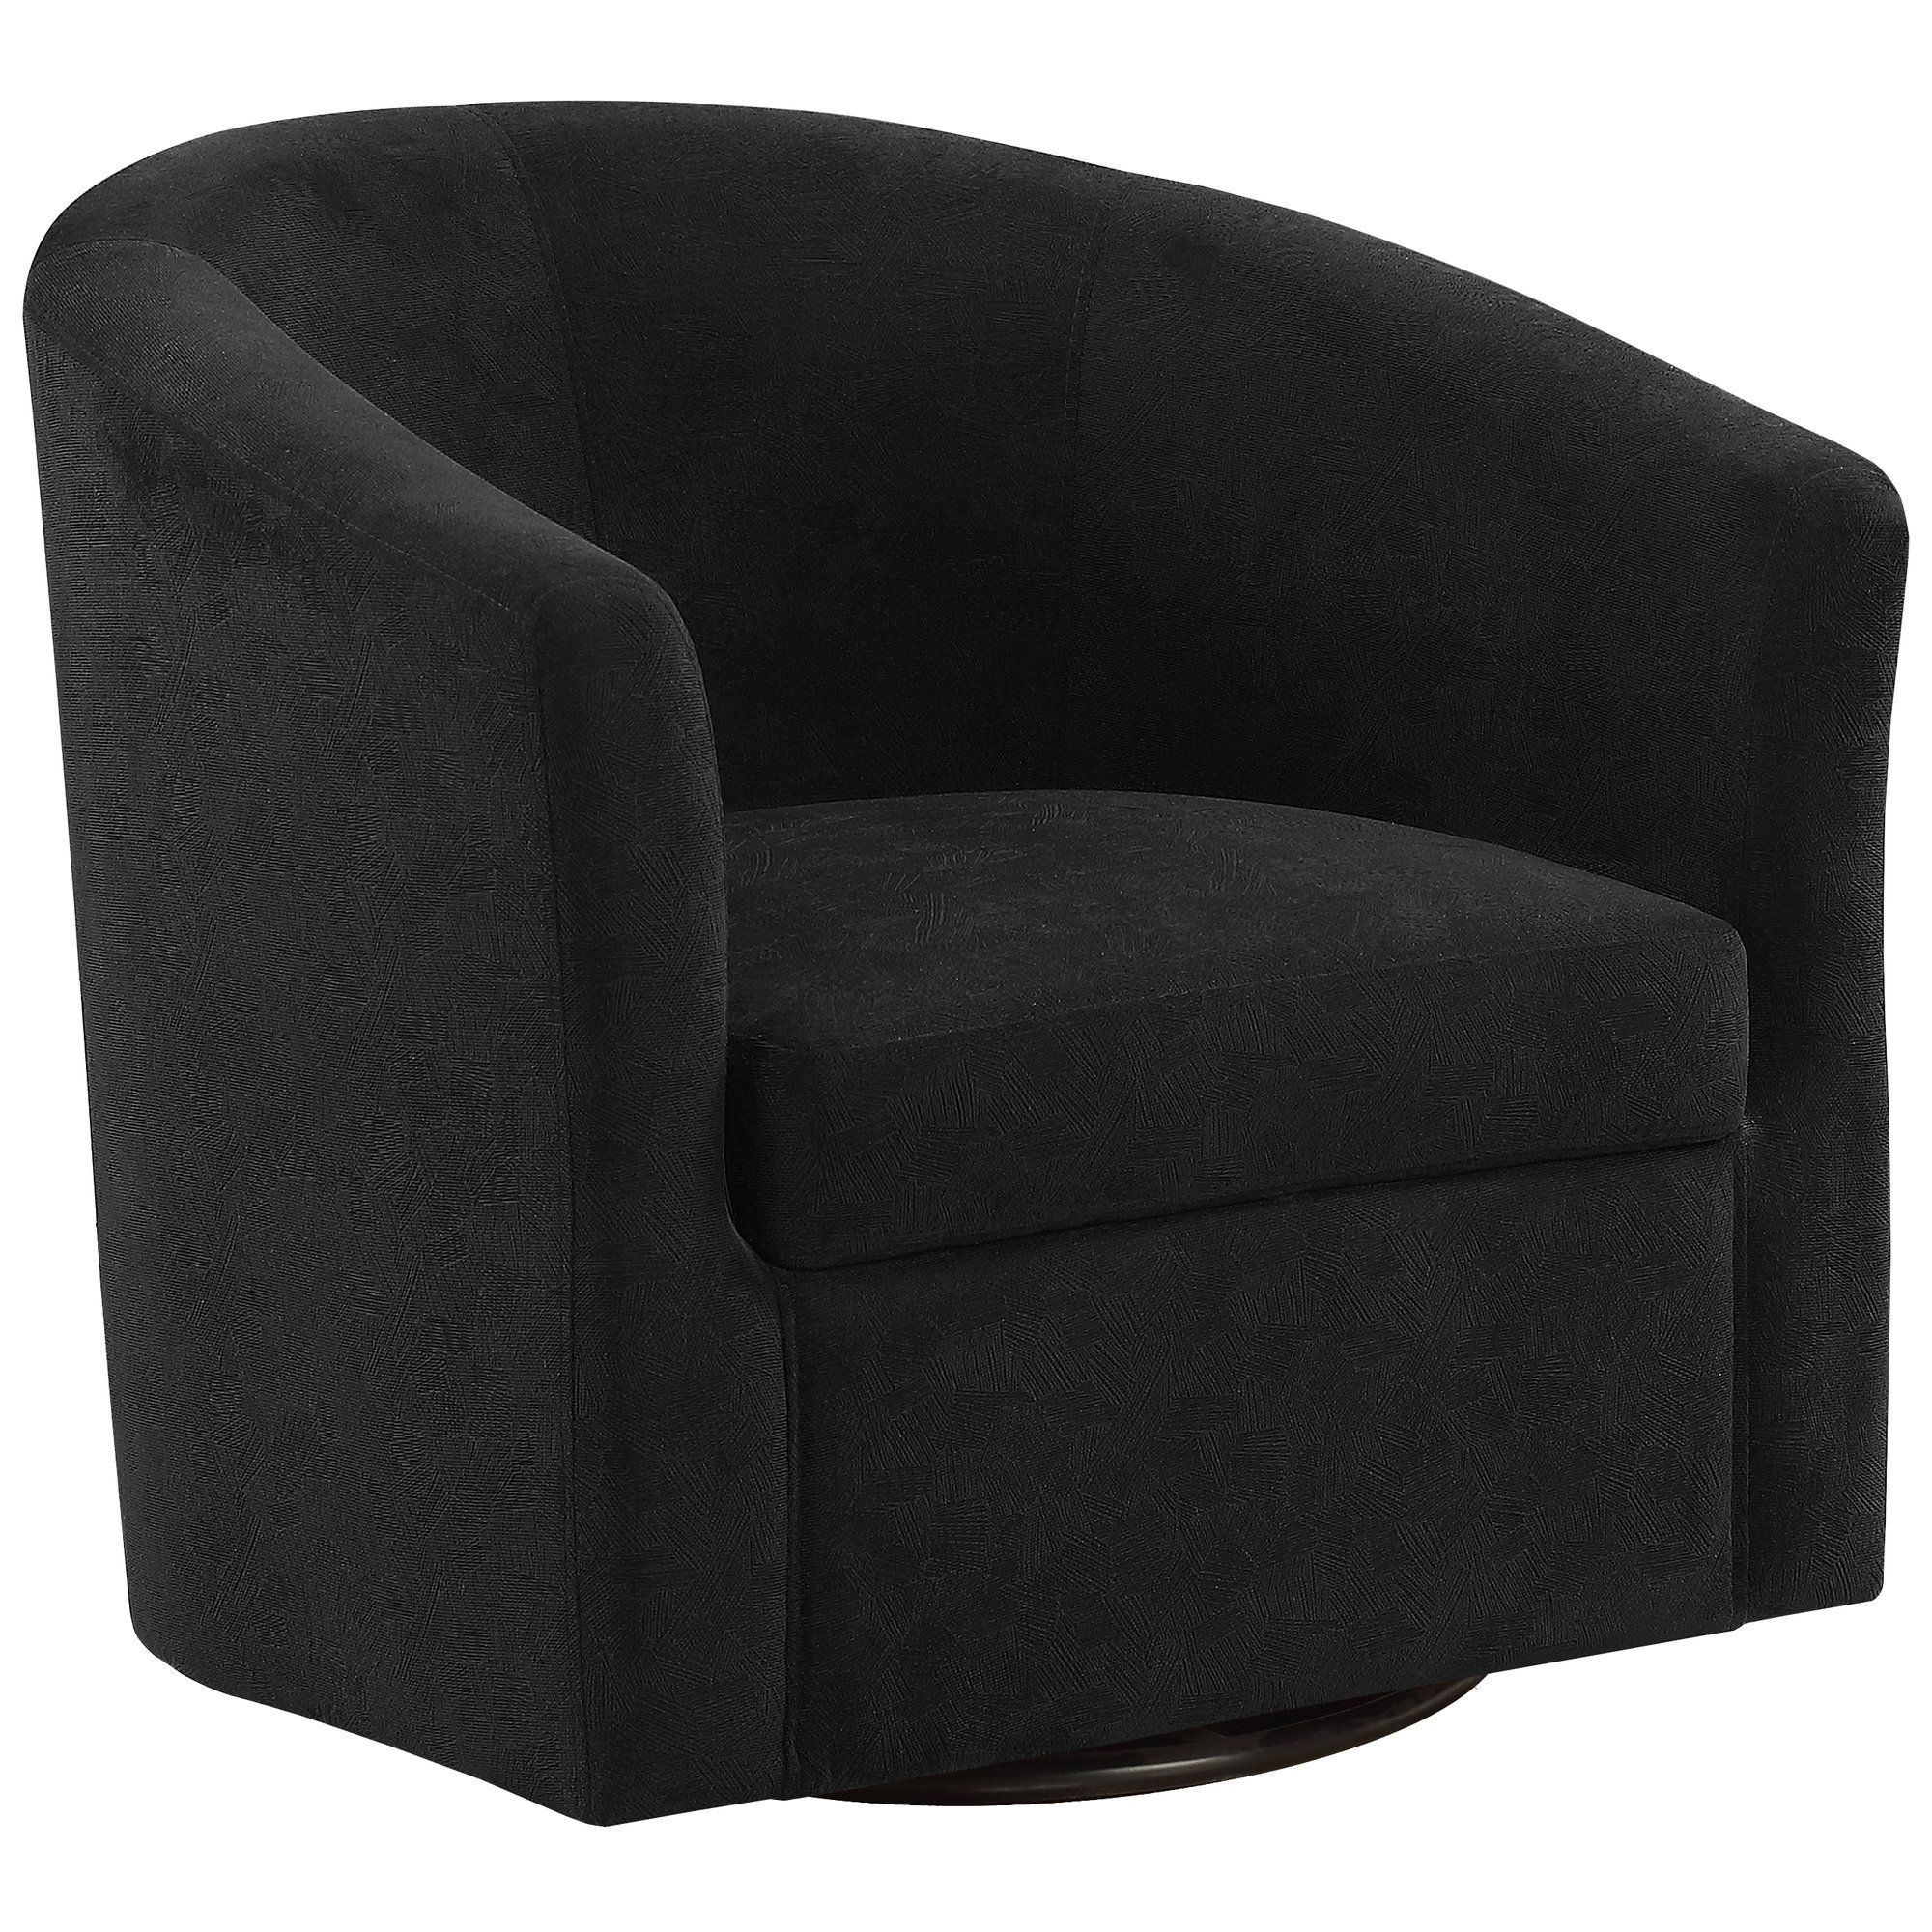 Accent chair swivel black abstract velvetfoam